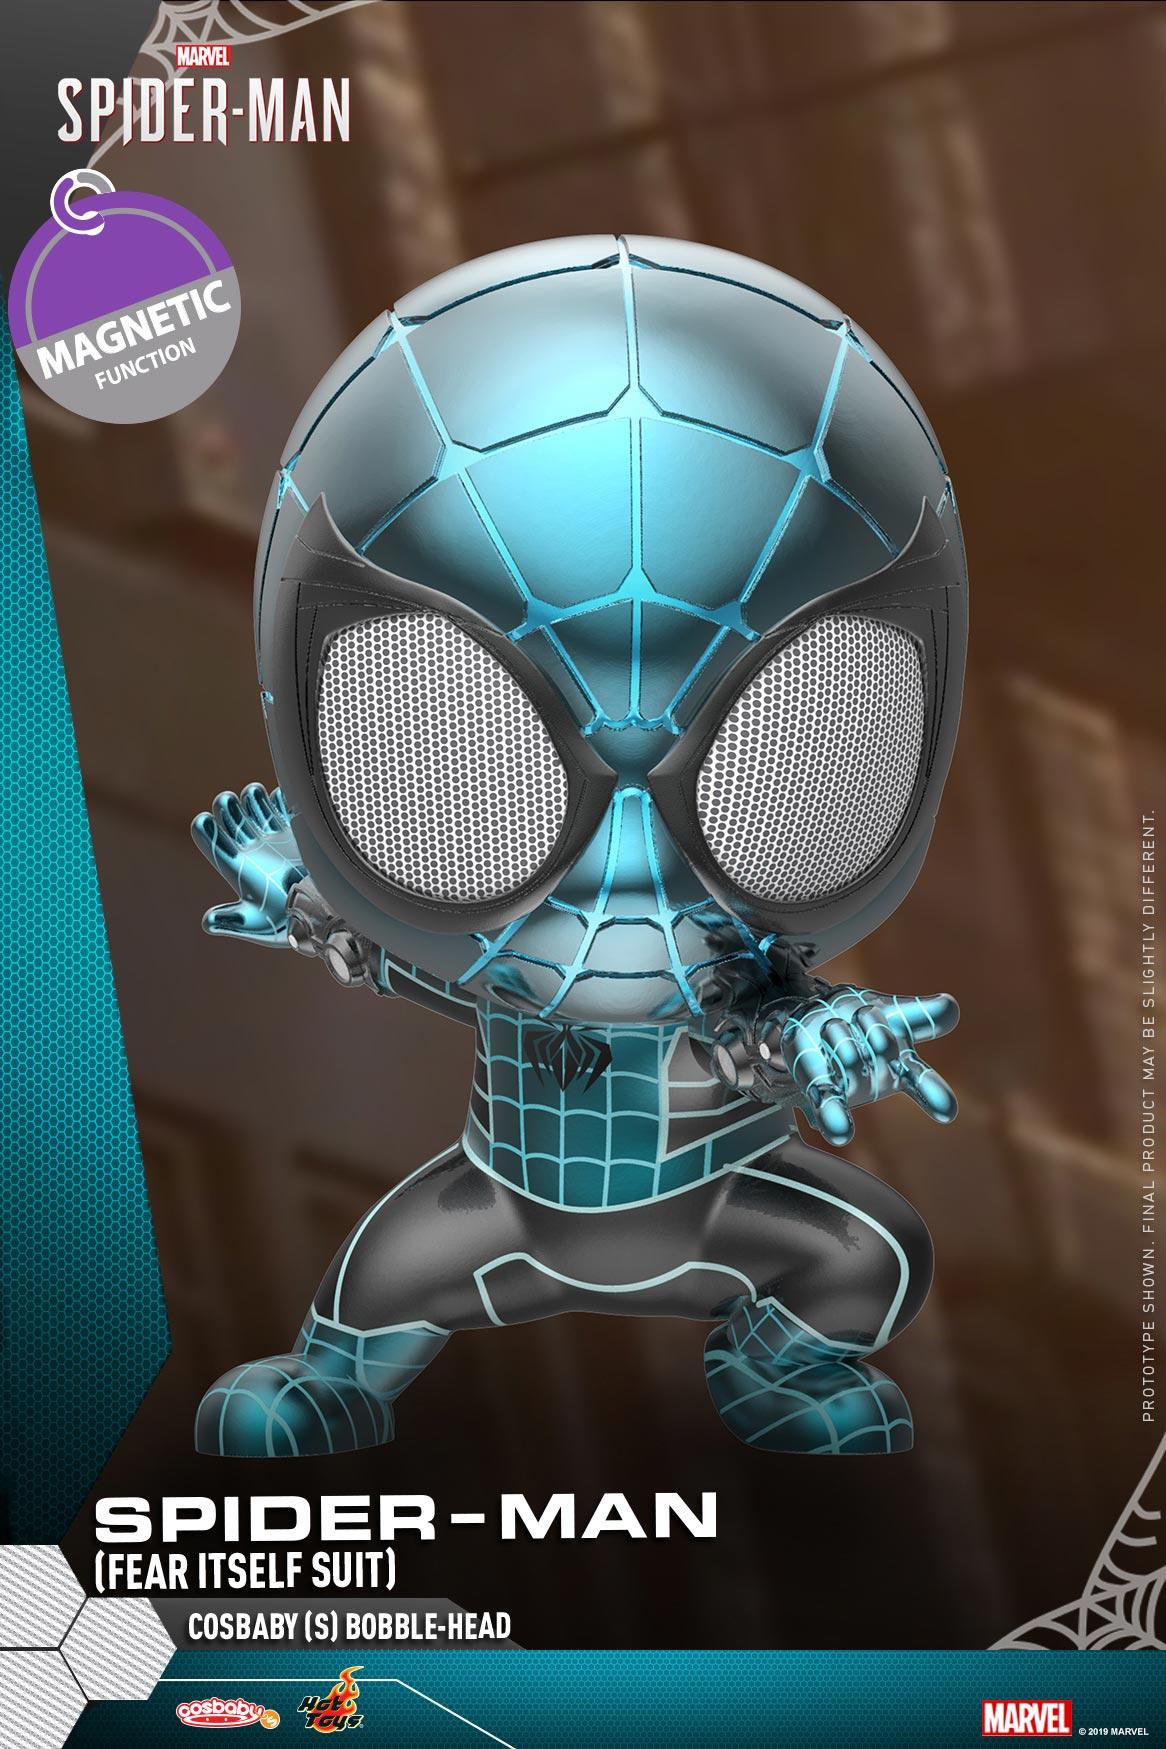 Hot-Toys---Marvel-Spider-Man---Spider-Man-(Fear-Itself-Suit)-Cosbaby-(S)_PR1